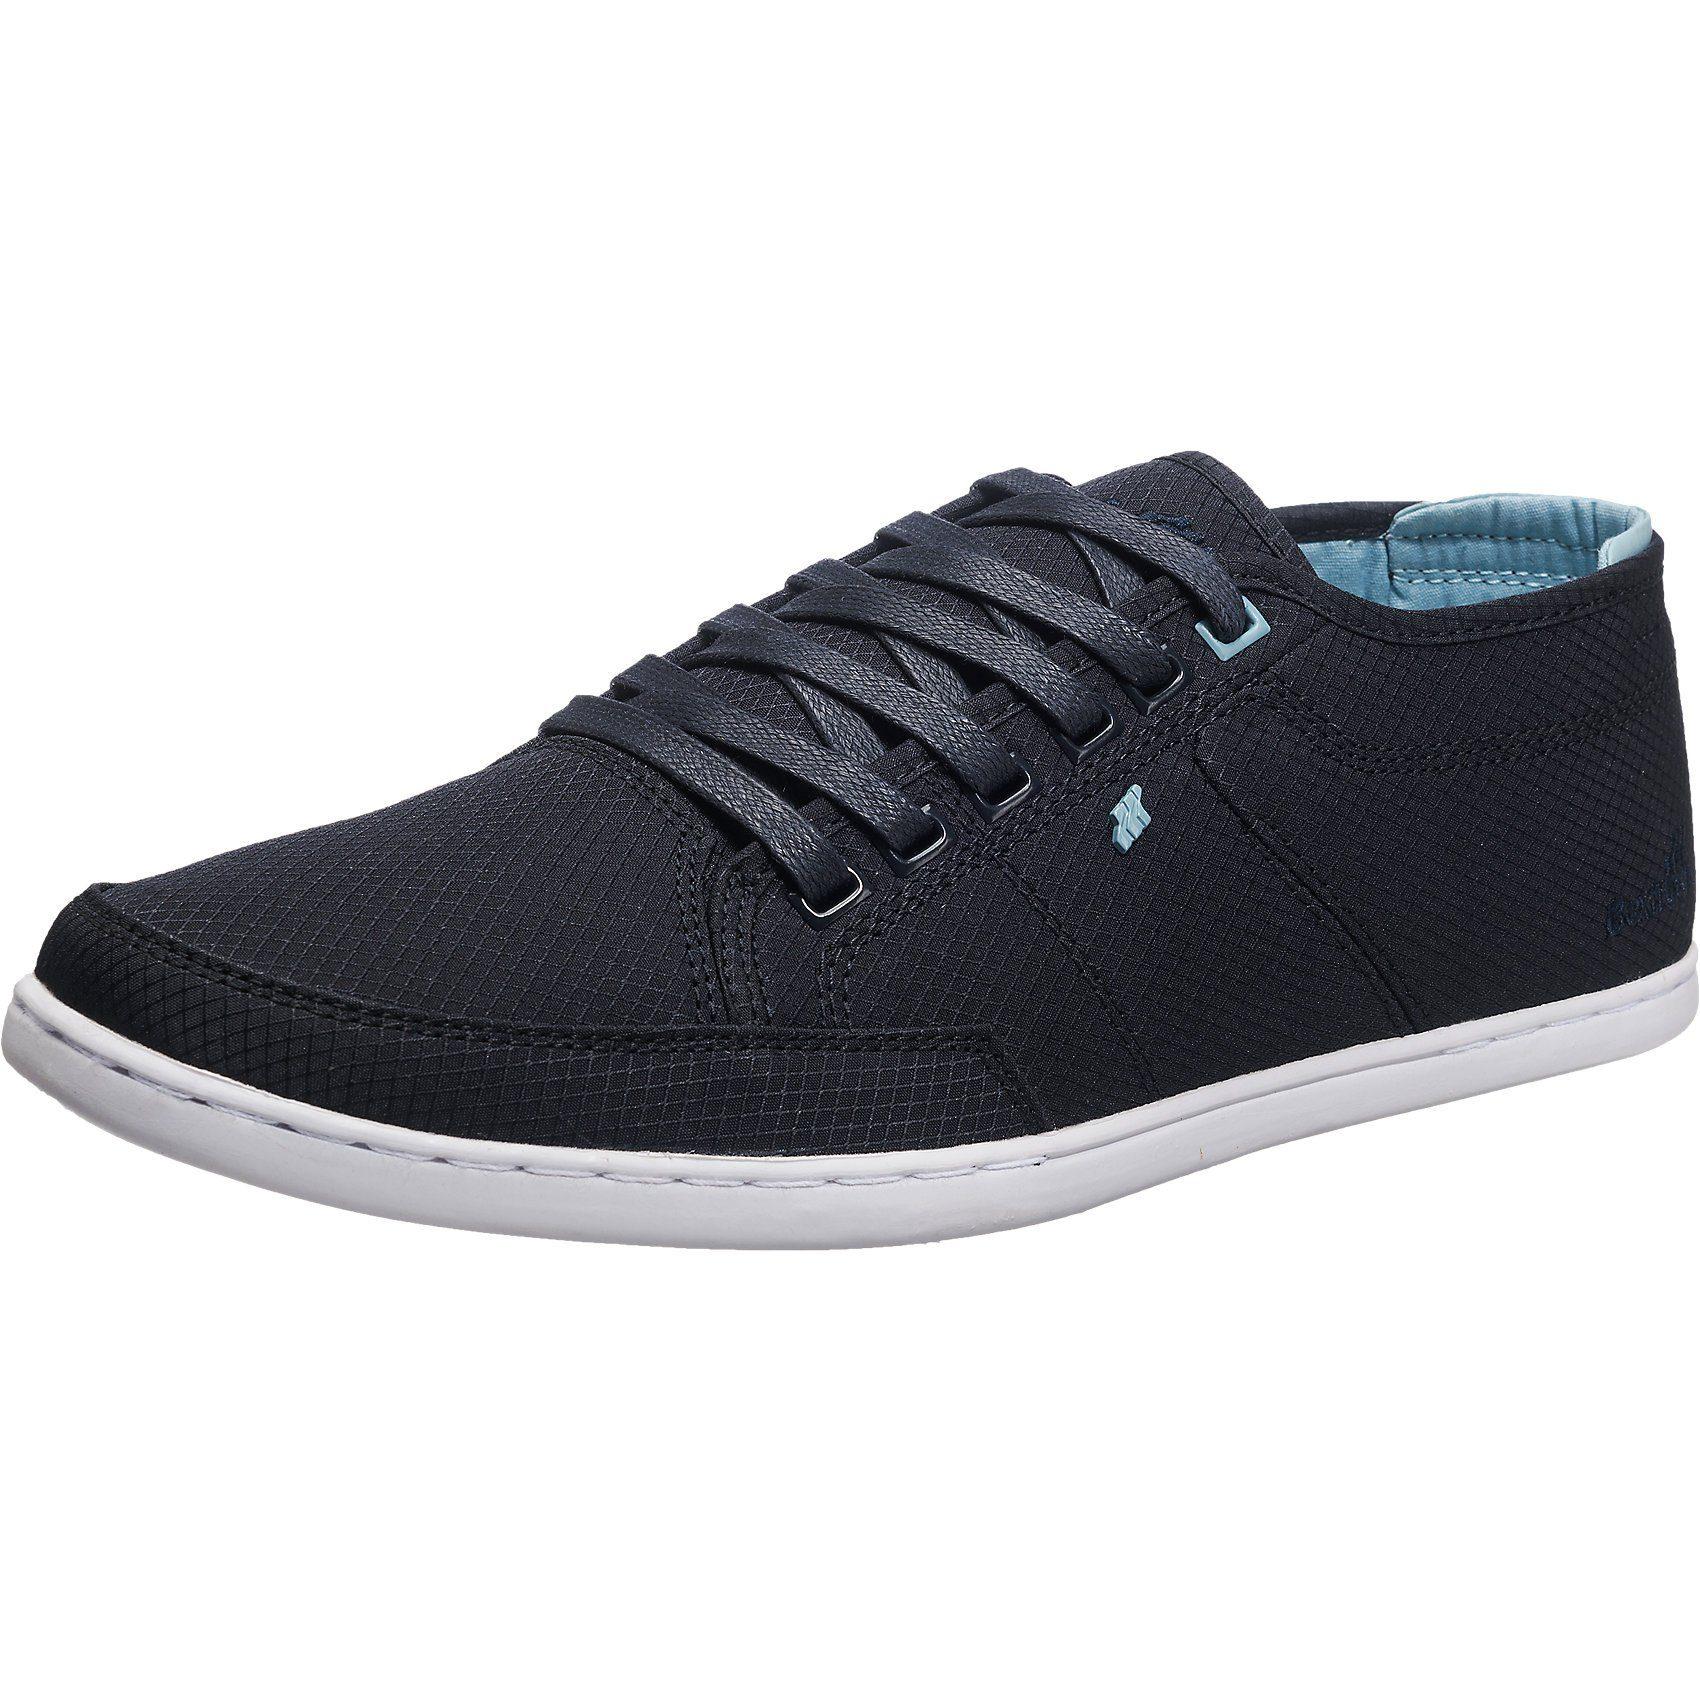 Boxfresh® Sparko Sneakers